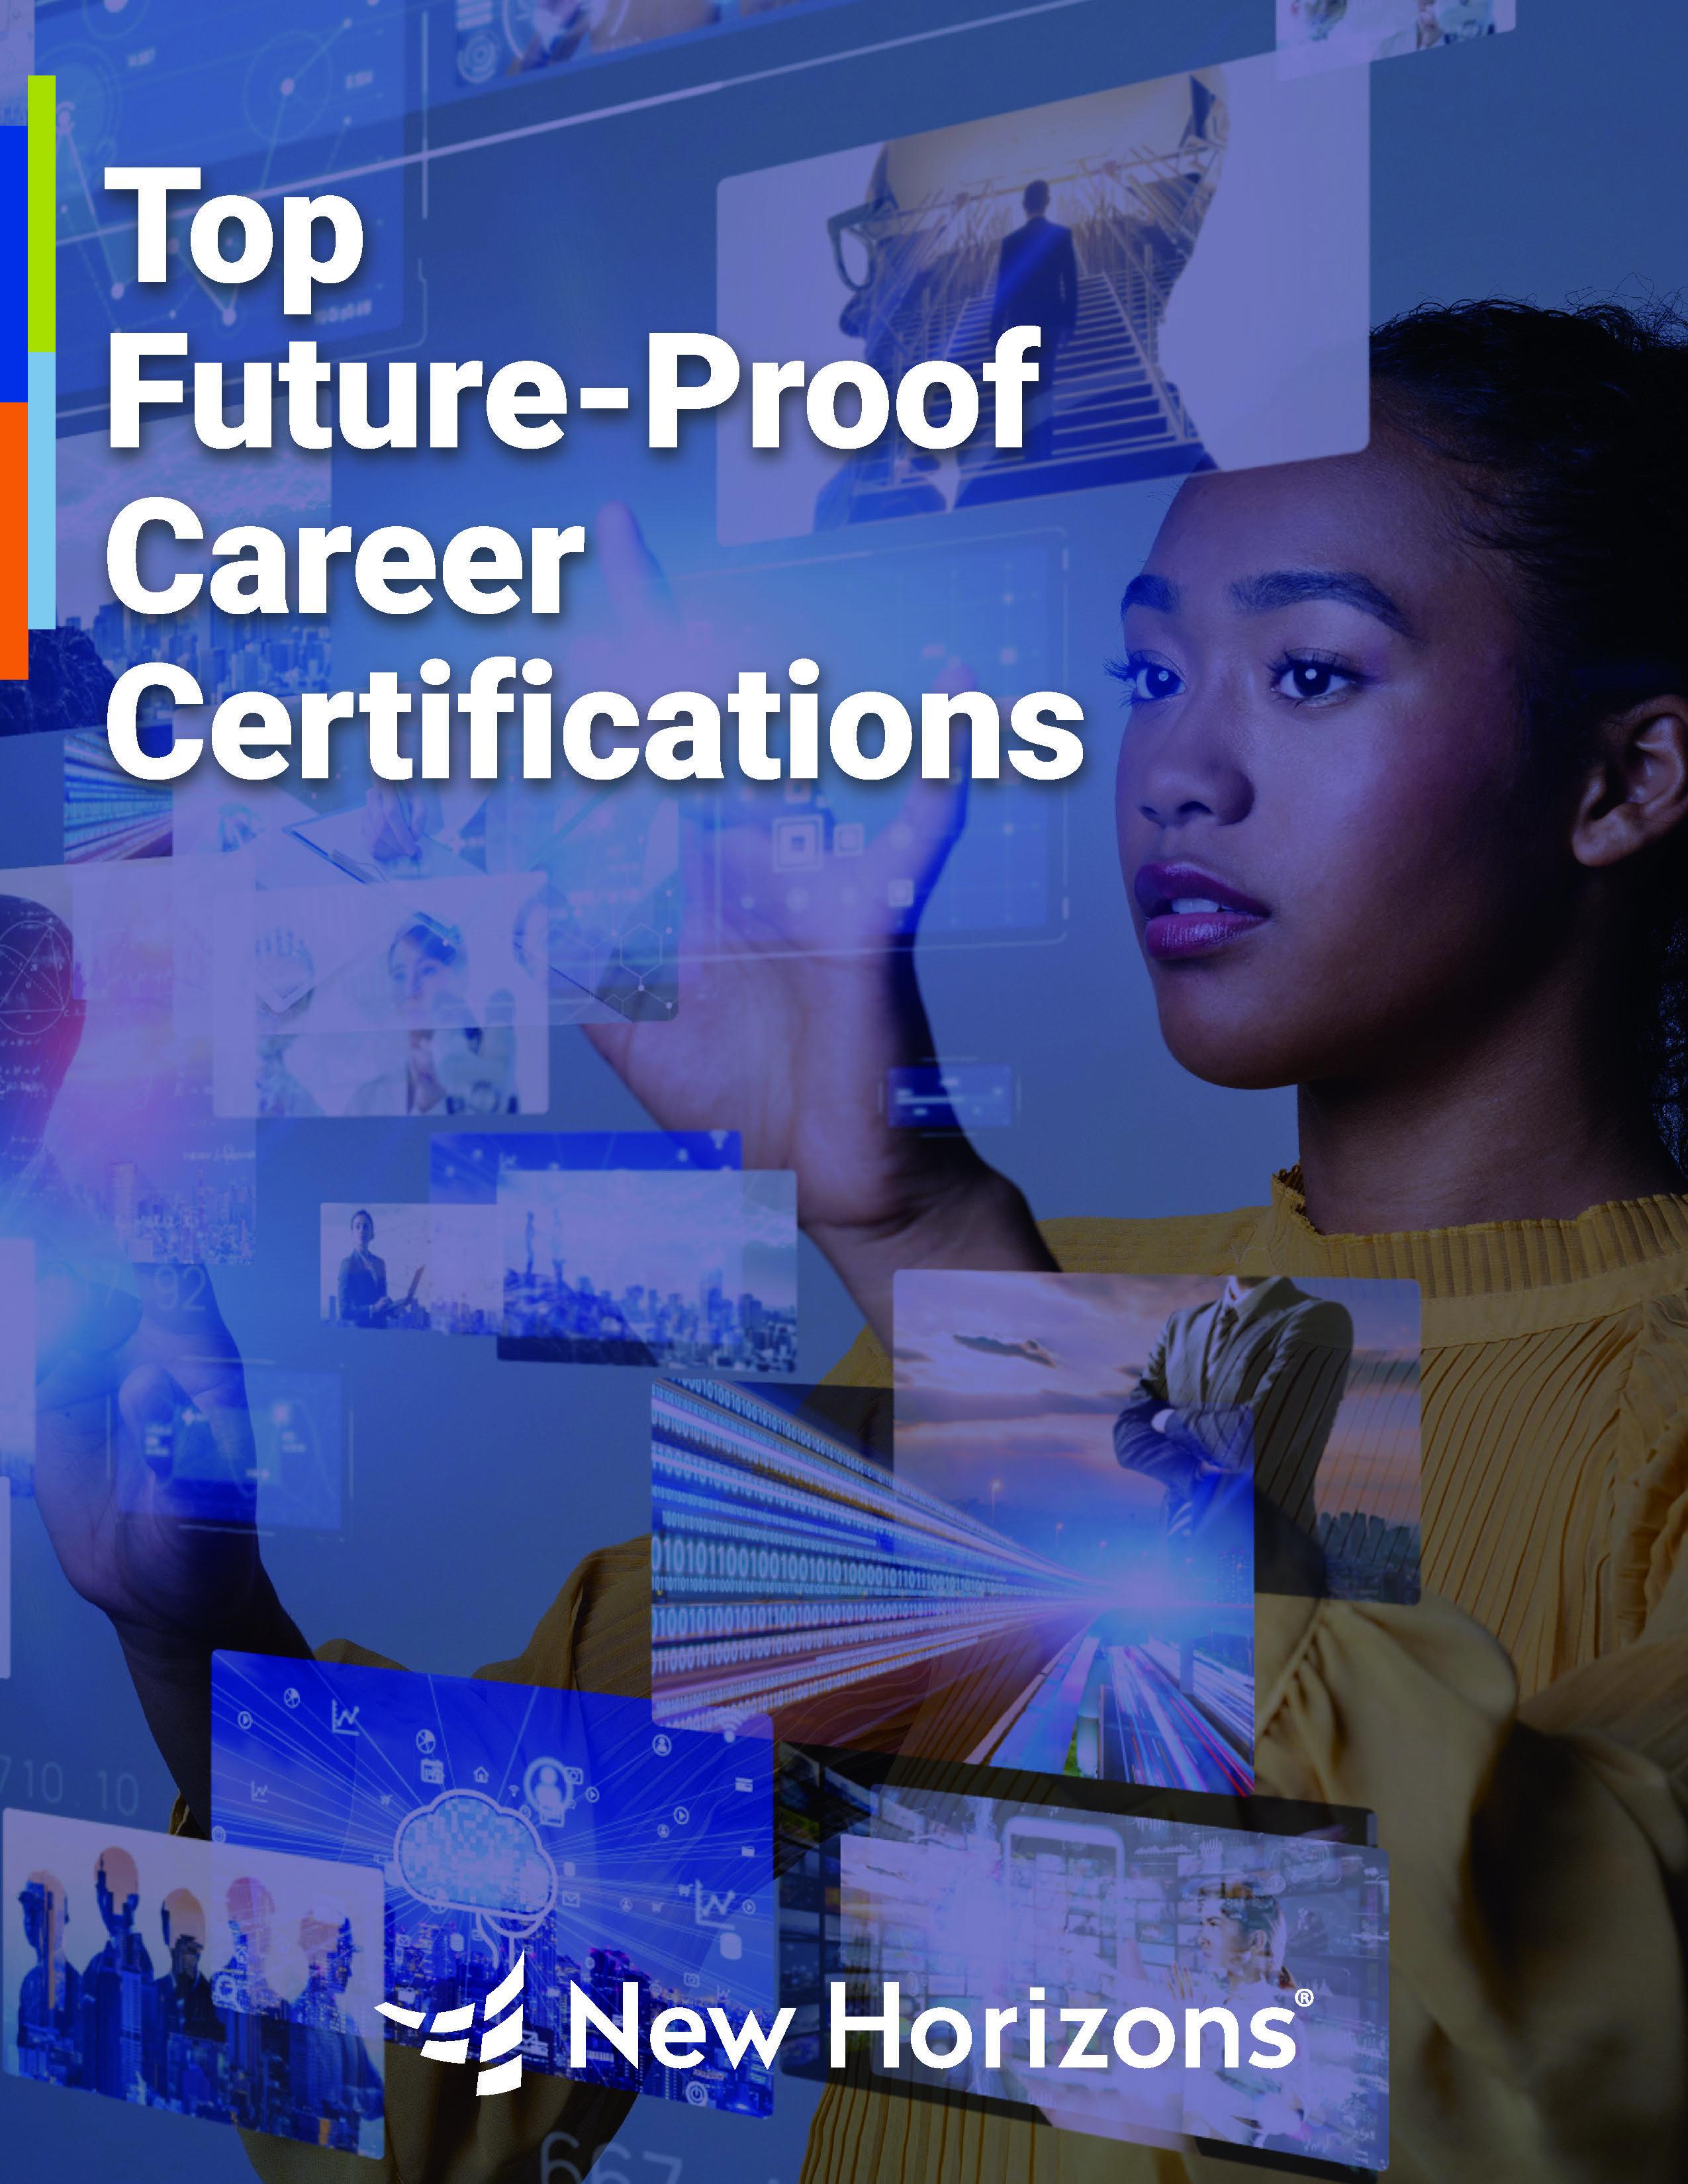 Top Future-Proof Career Certifications